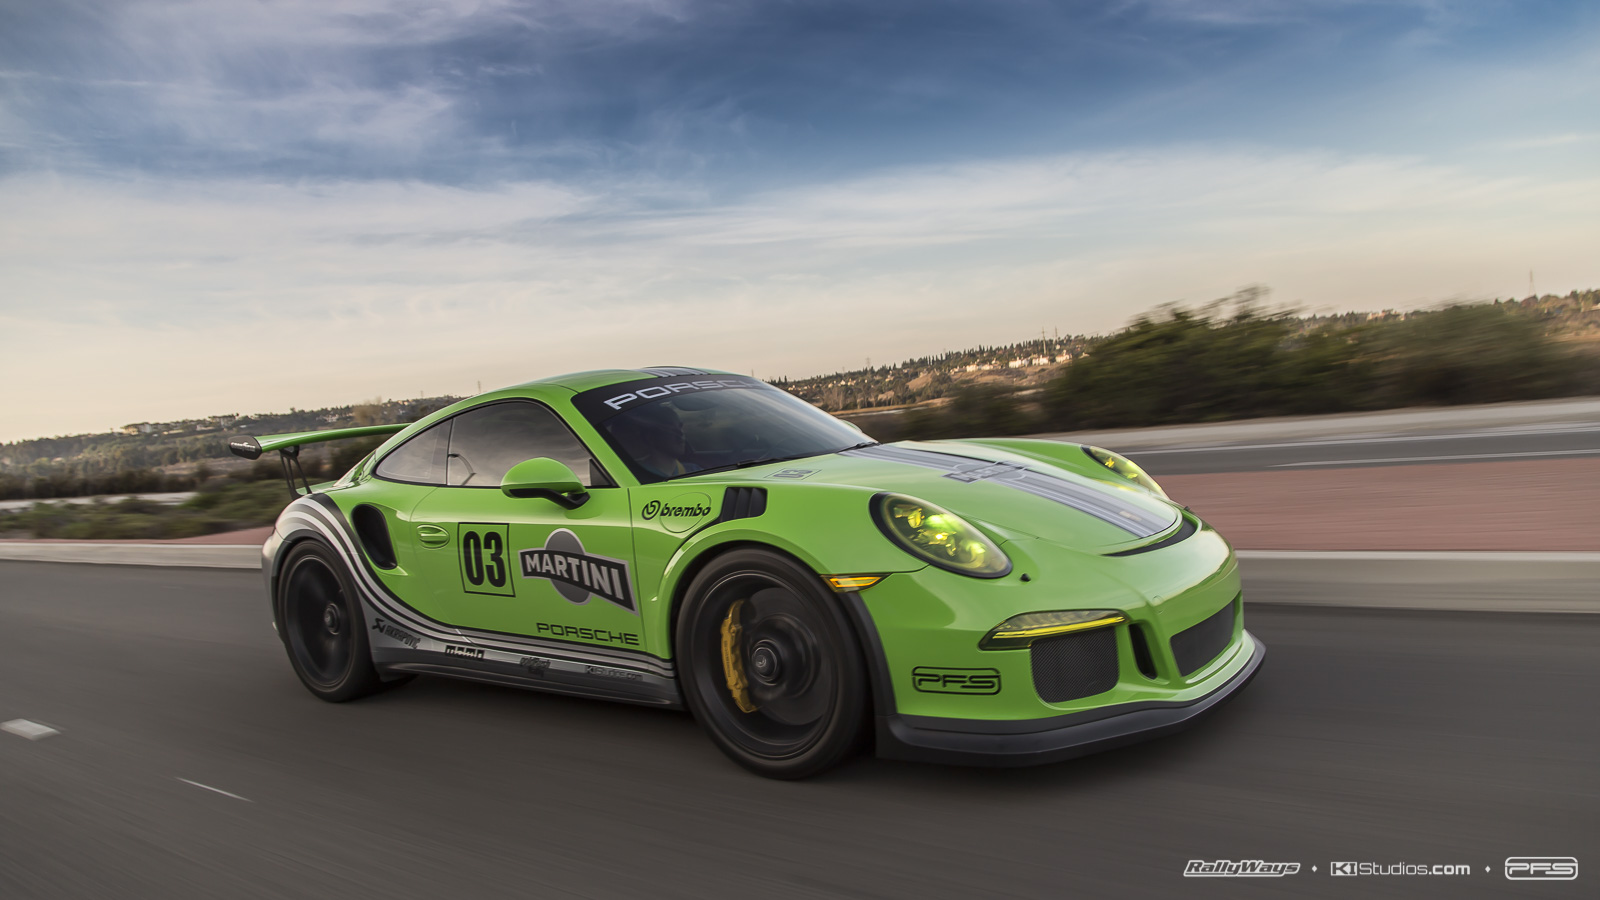 Green Martini Porsche 991 GT3 RS